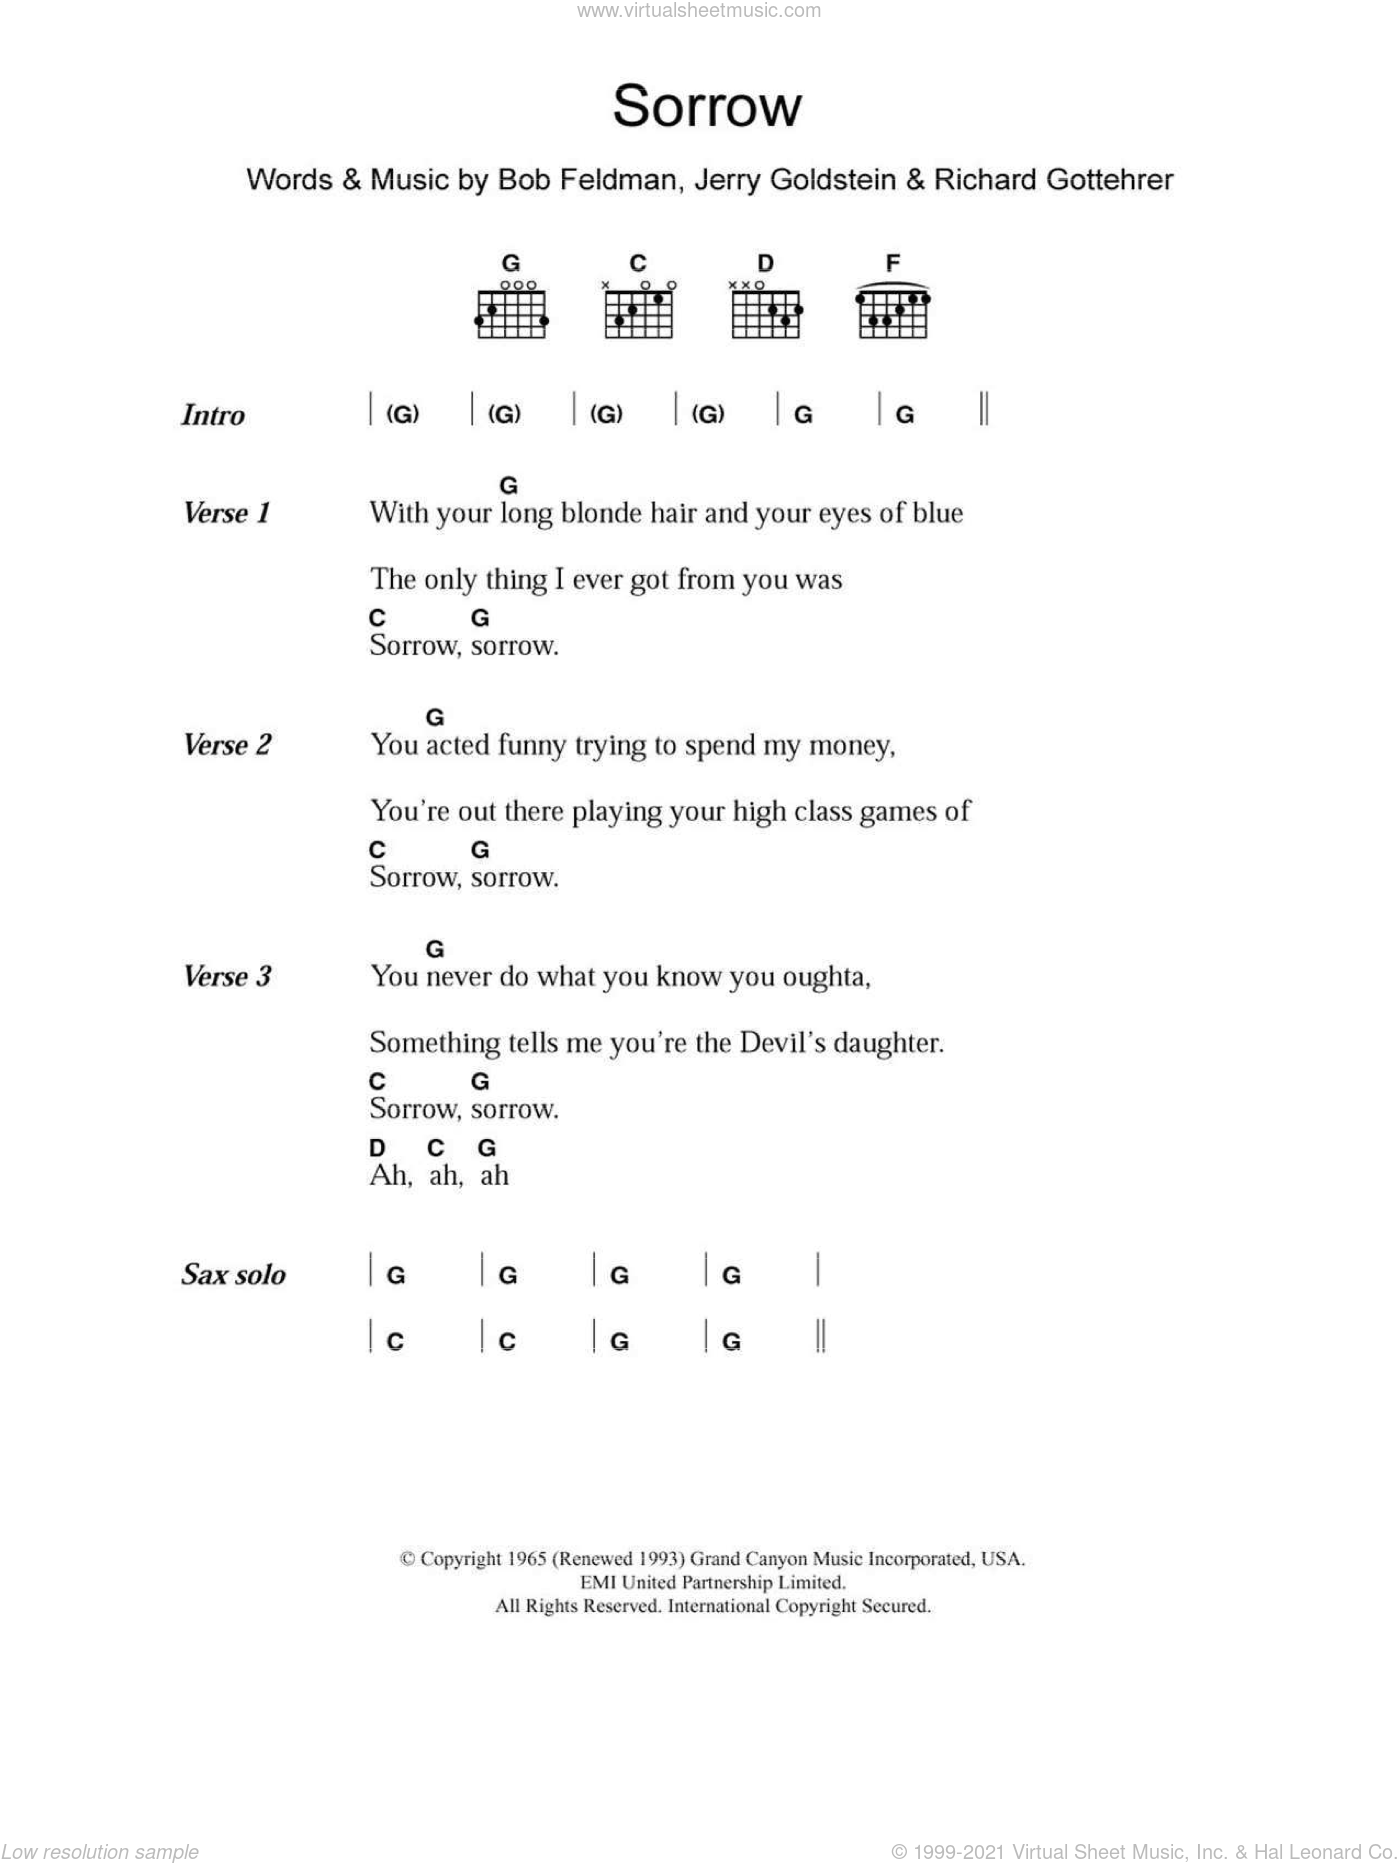 Sorrow sheet music for guitar (chords) by David Bowie, Bob Feldman, Jerry Goldstein and Richard Gottehrer, intermediate skill level